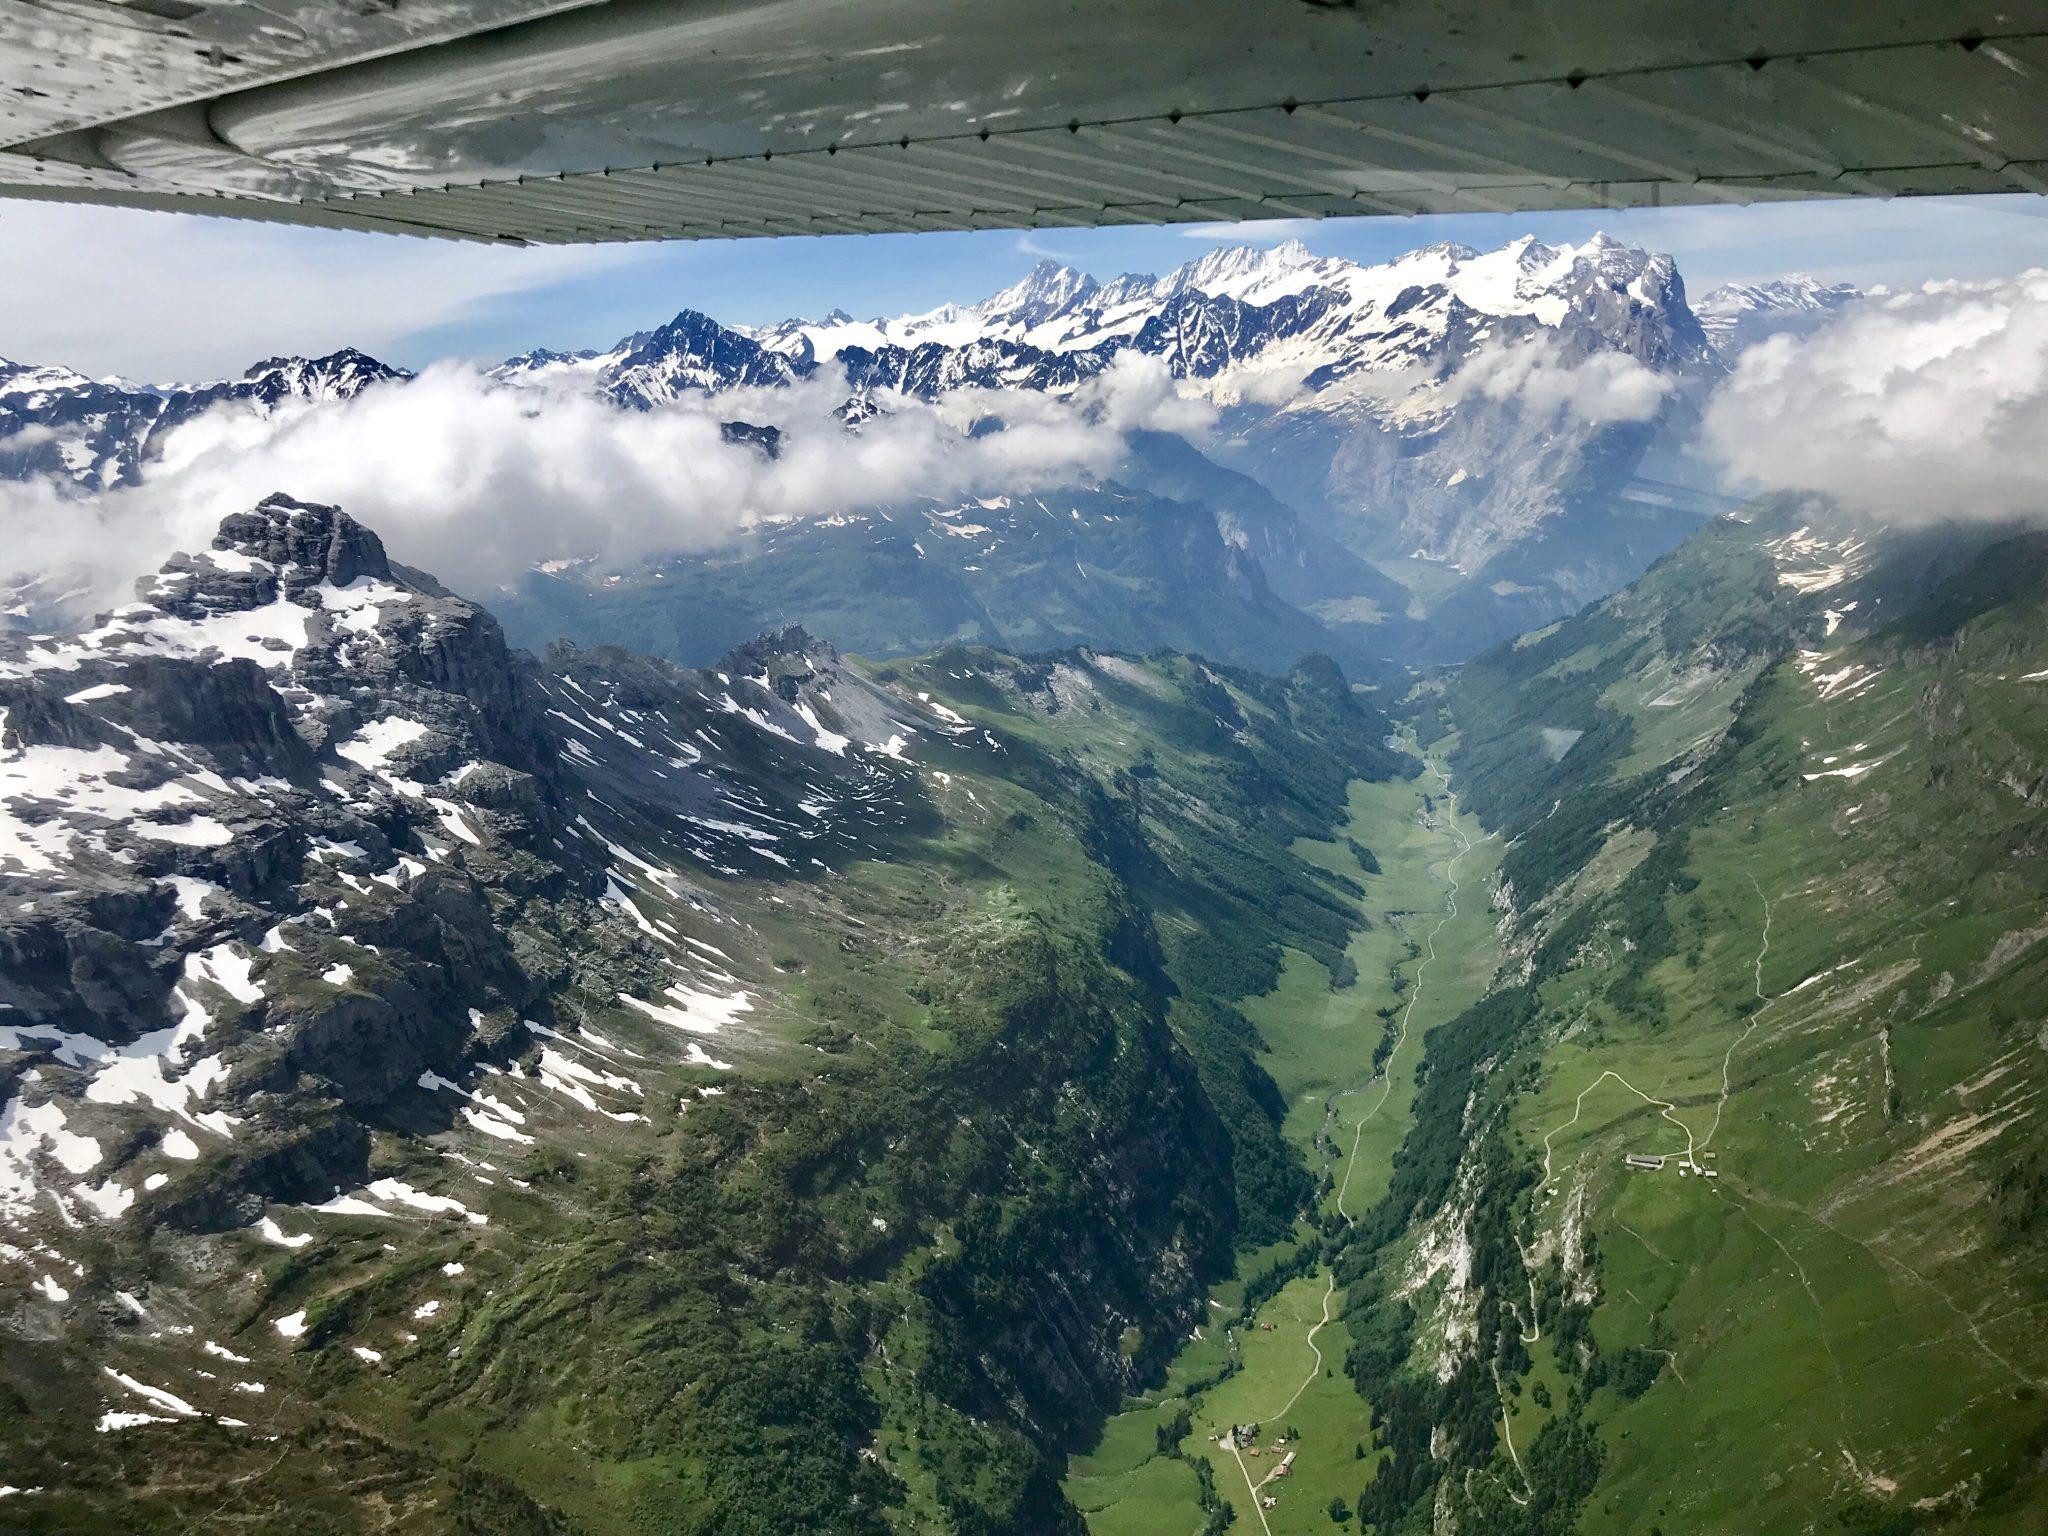 Flying over Engstlenalp looking towards Innertkirchen